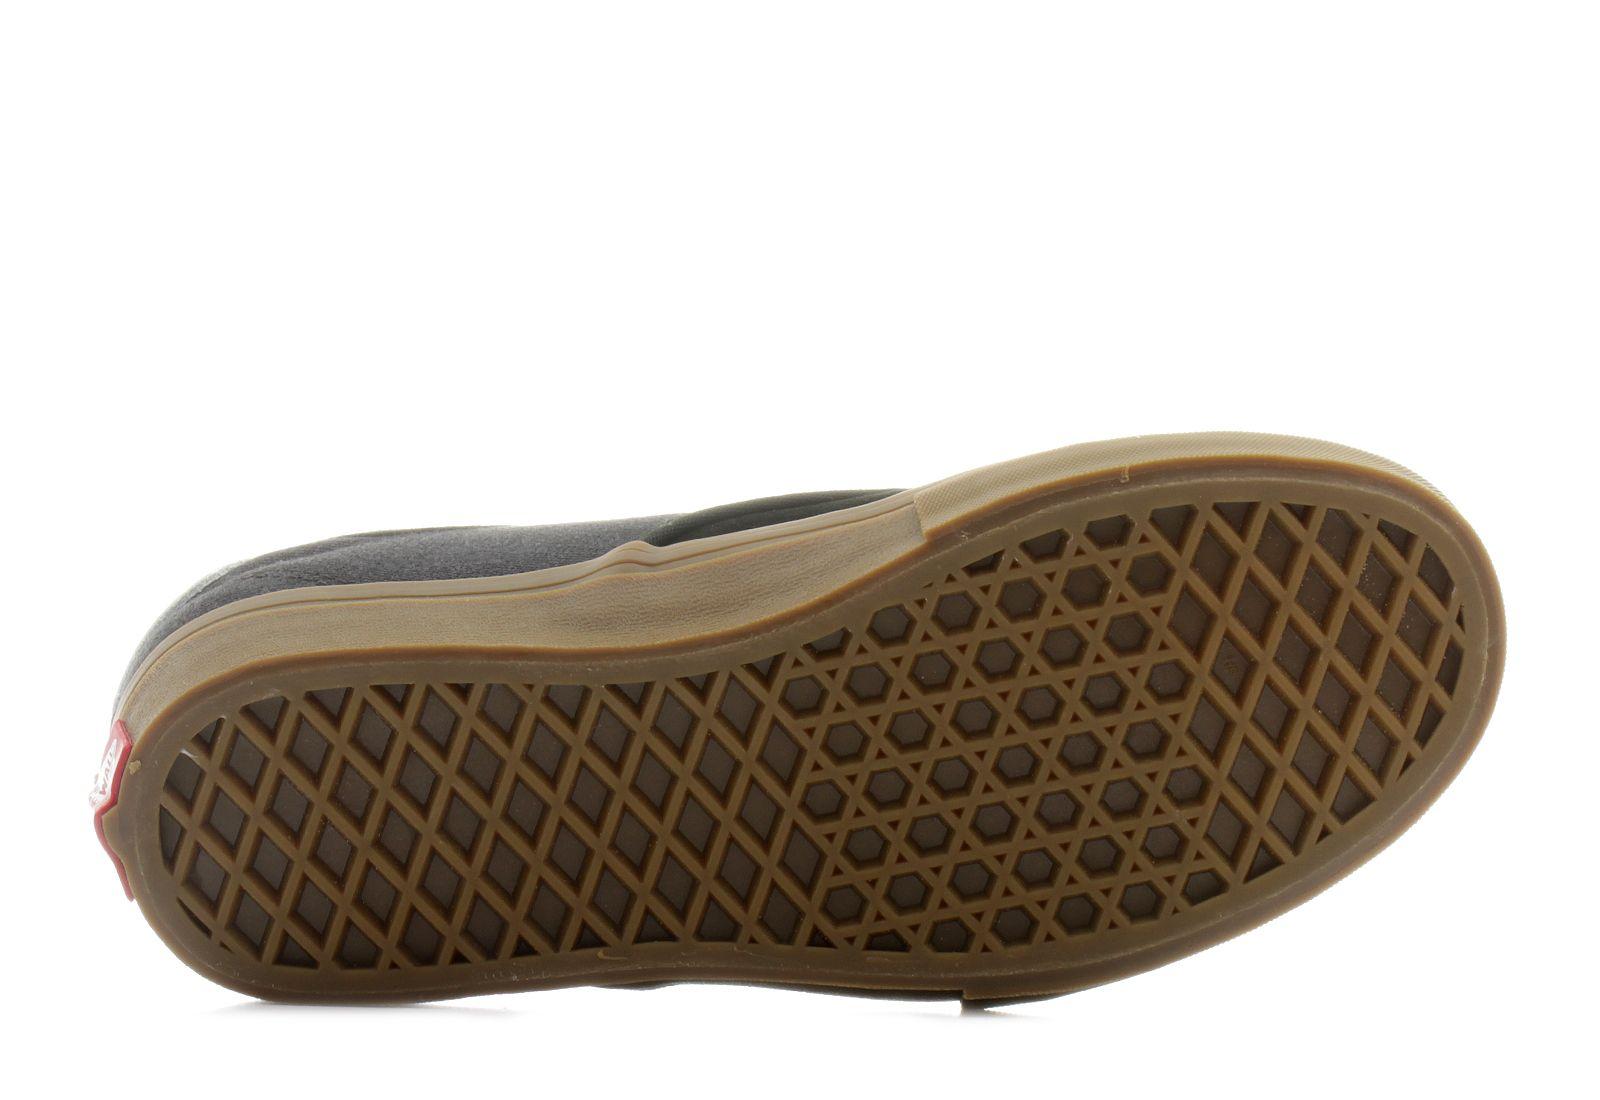 Vans Sneakers - Chima Ferguson Pro - VA349TGPL - Online shop for ...